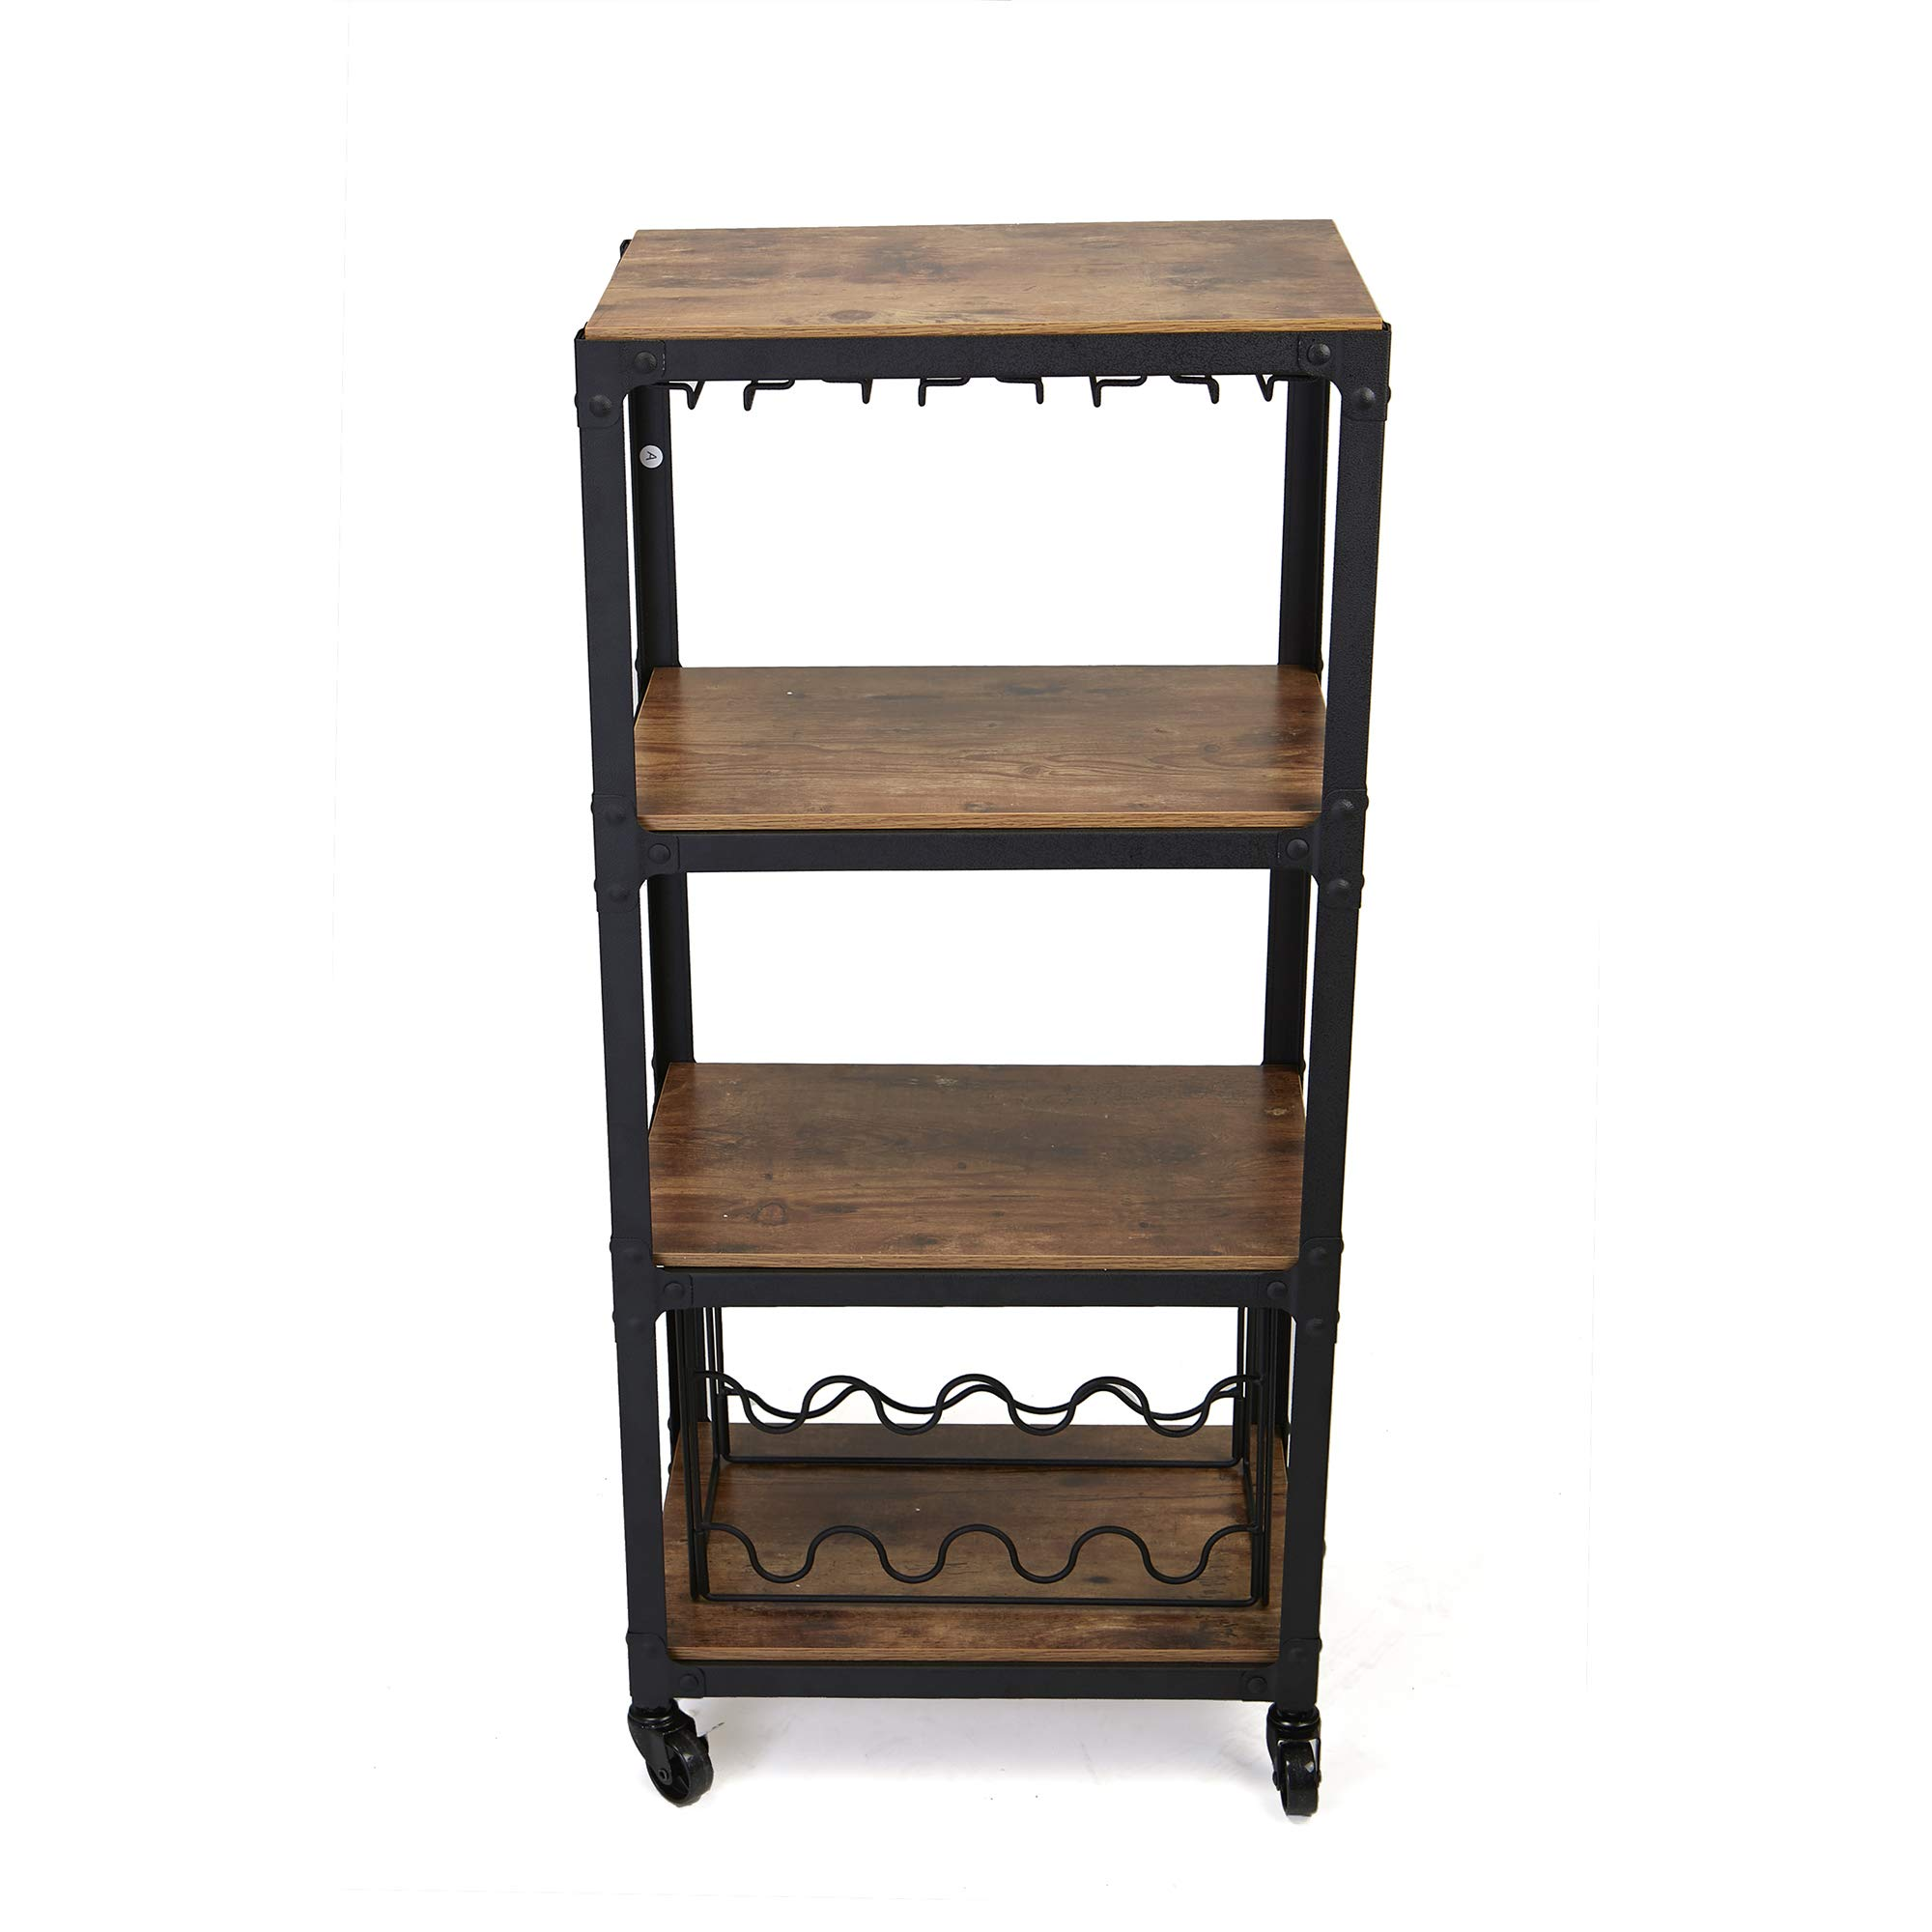 Mind Reader Mobile Kitchen Cart with Wine Rack and Stemware Storage, Black by Mind Reader